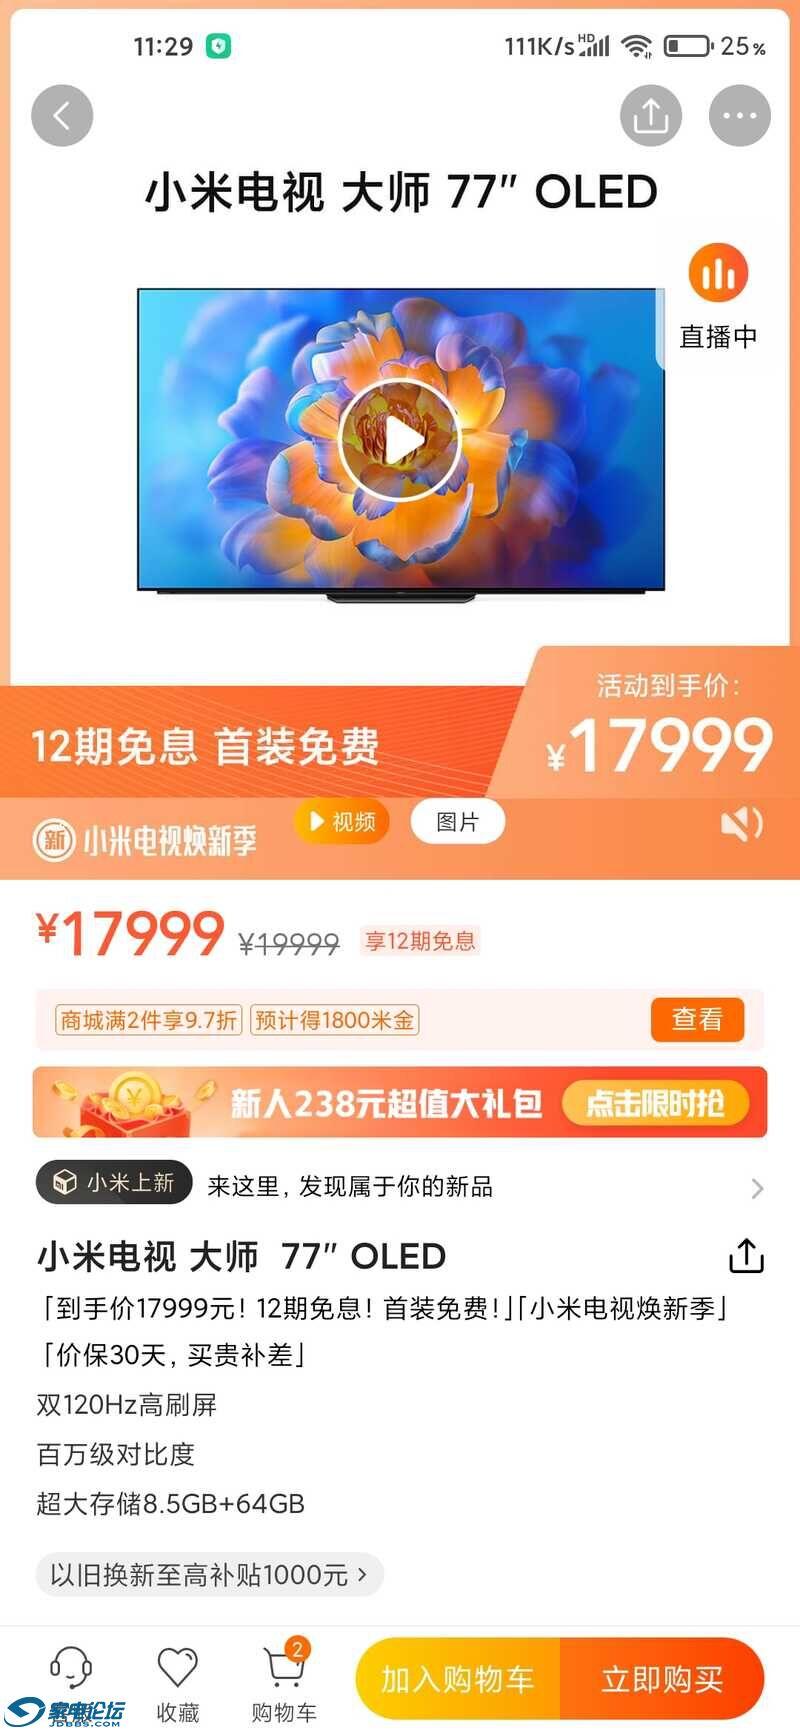 Screenshot_2021-10-13-11-29-17-269_com.xiaomi.shop.jpg